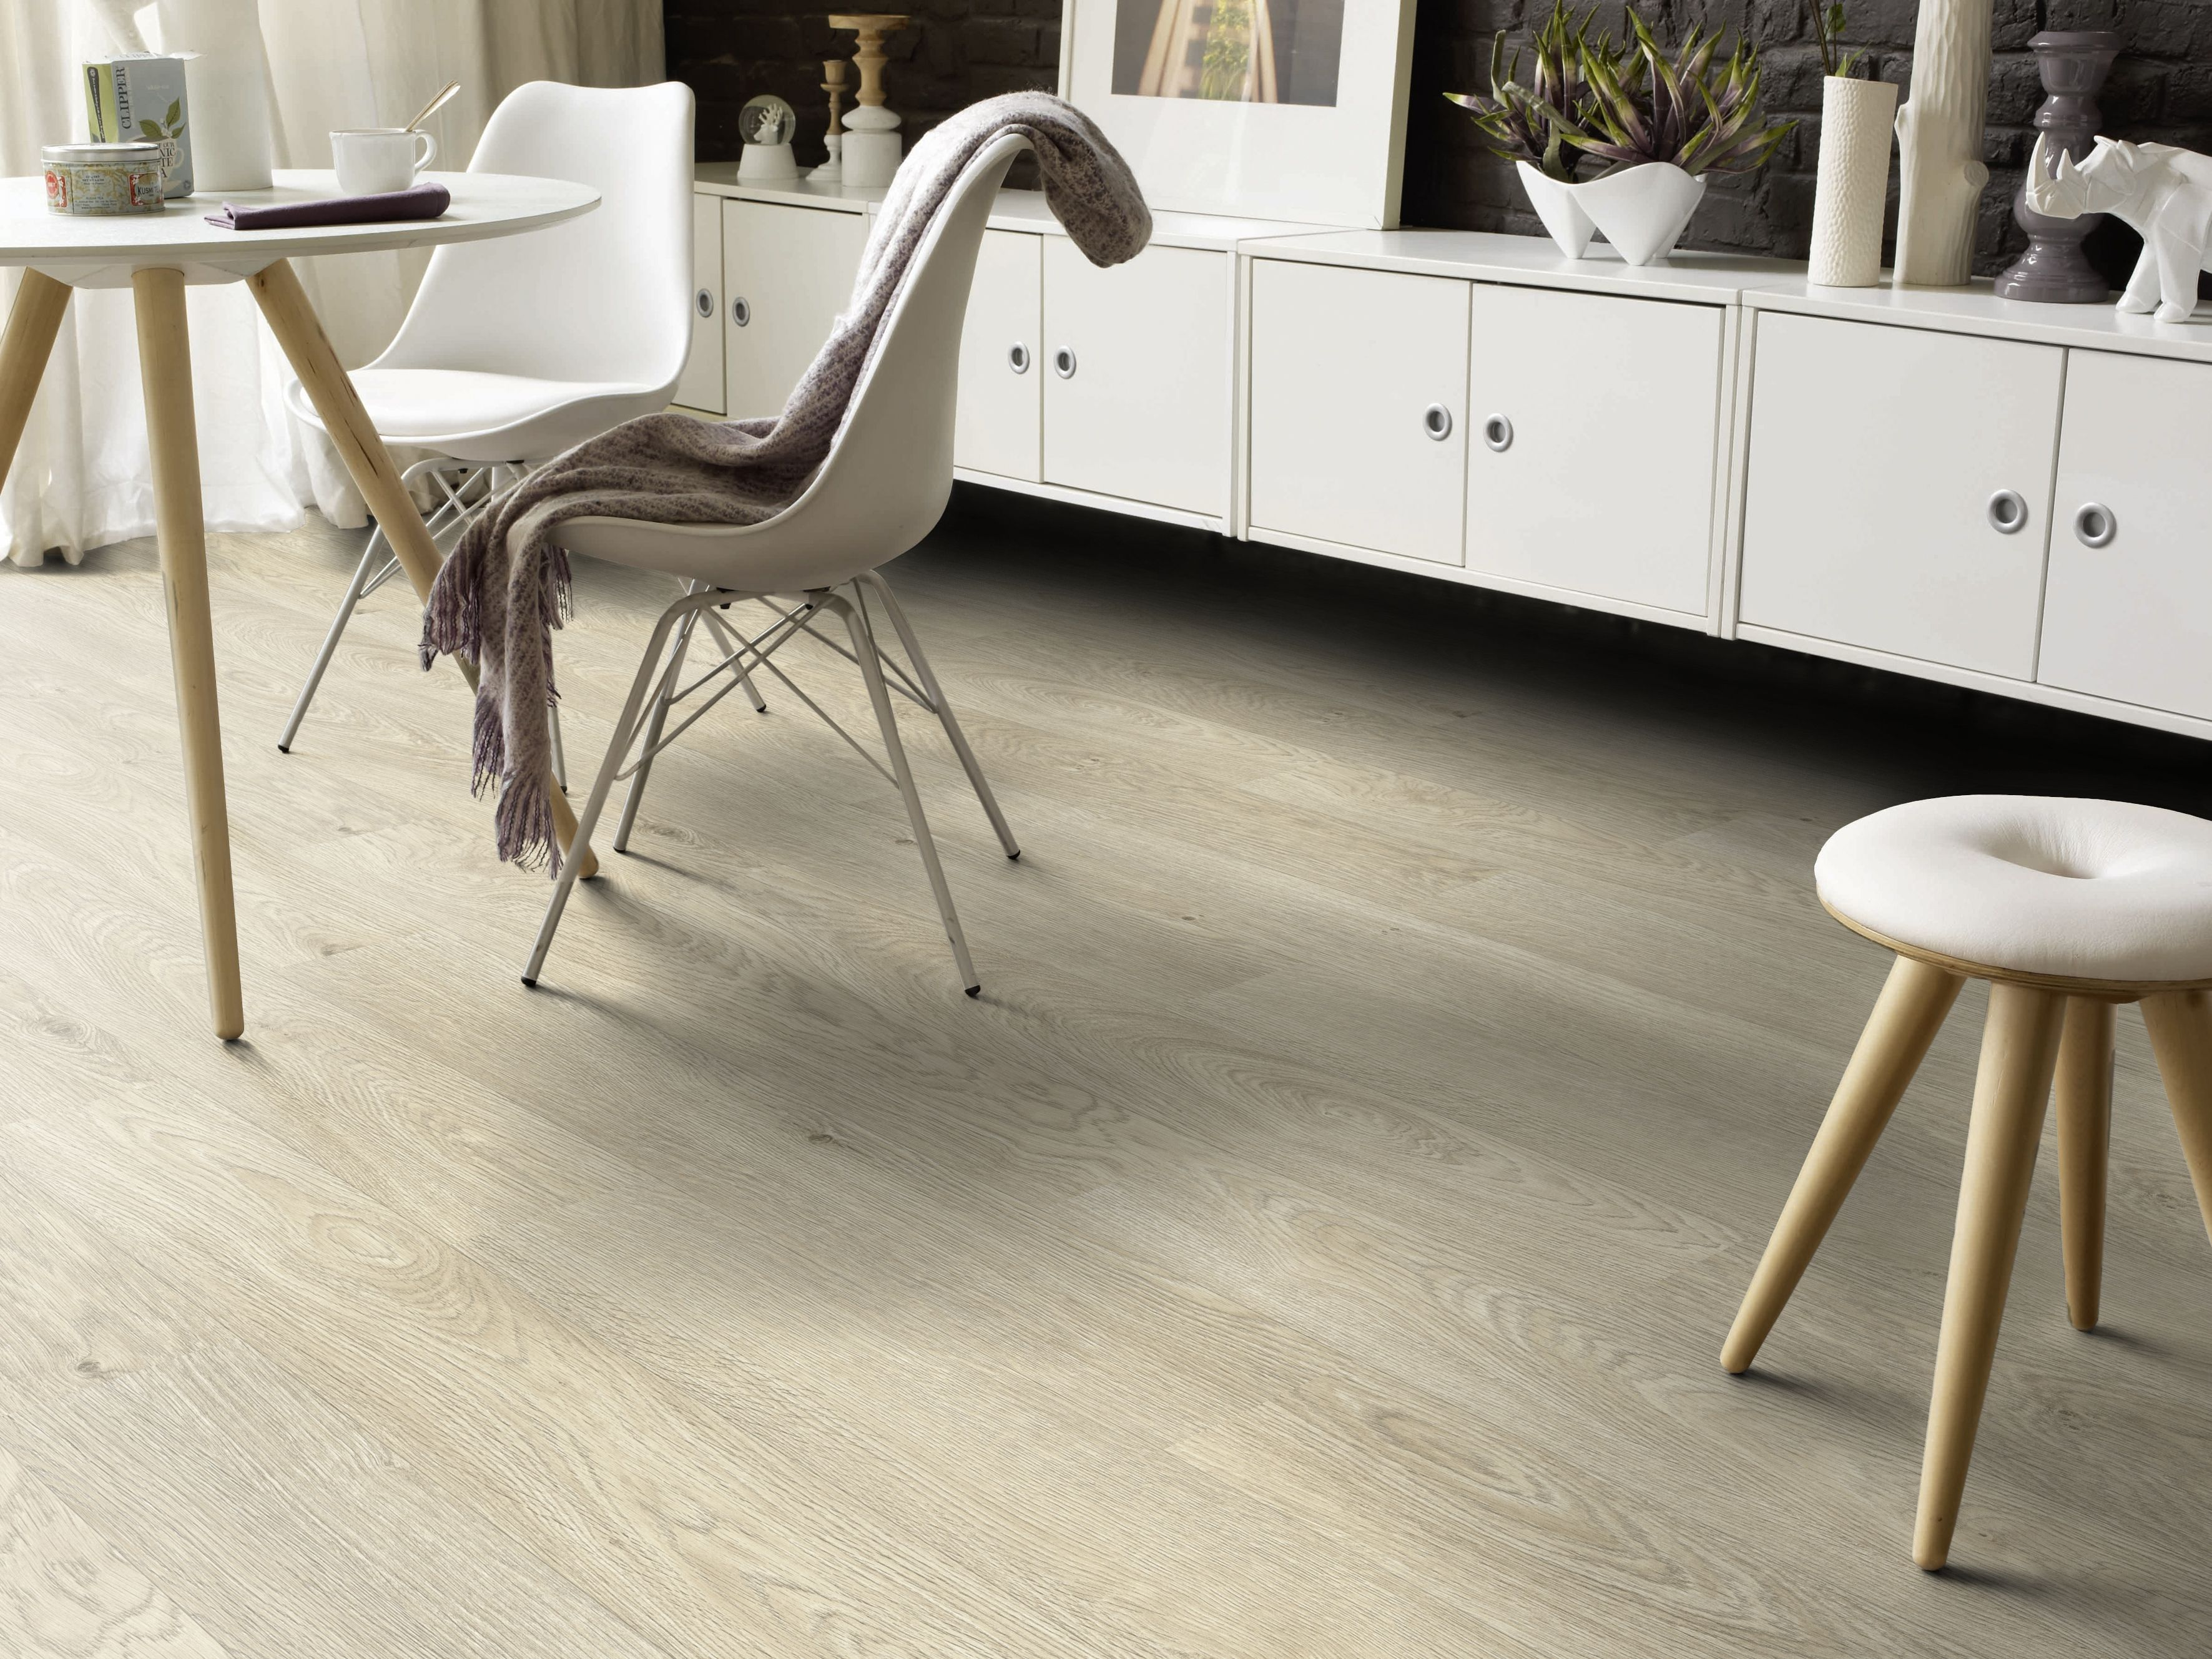 laminatboden holzprofi24 wohnen mit holz. Black Bedroom Furniture Sets. Home Design Ideas